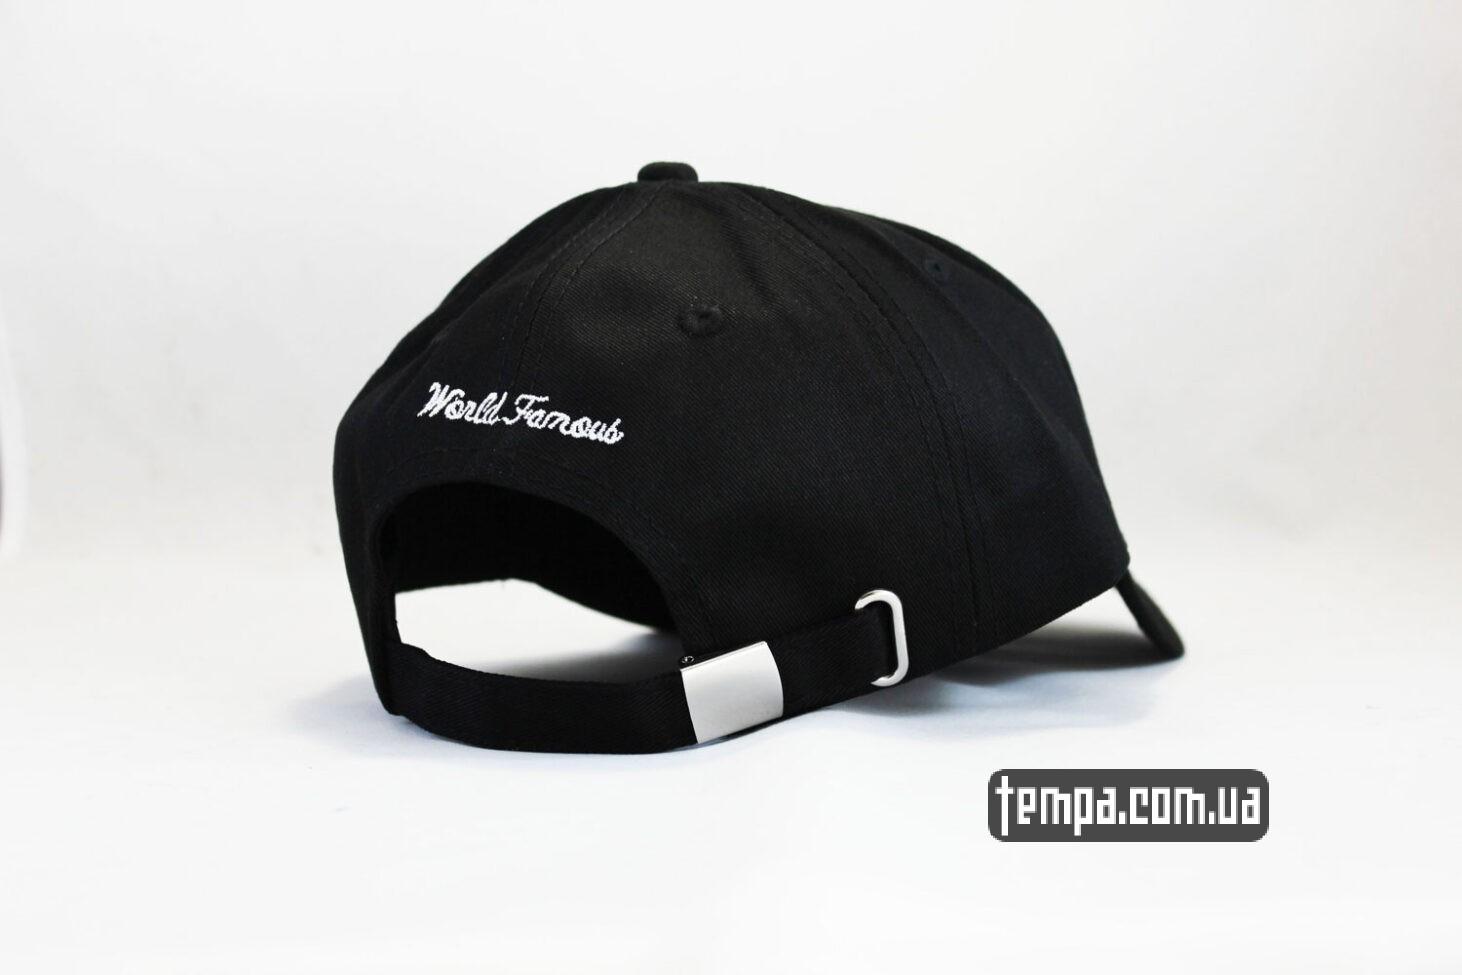 world famous кепка бейсболка supreme черный логотип суприм украина